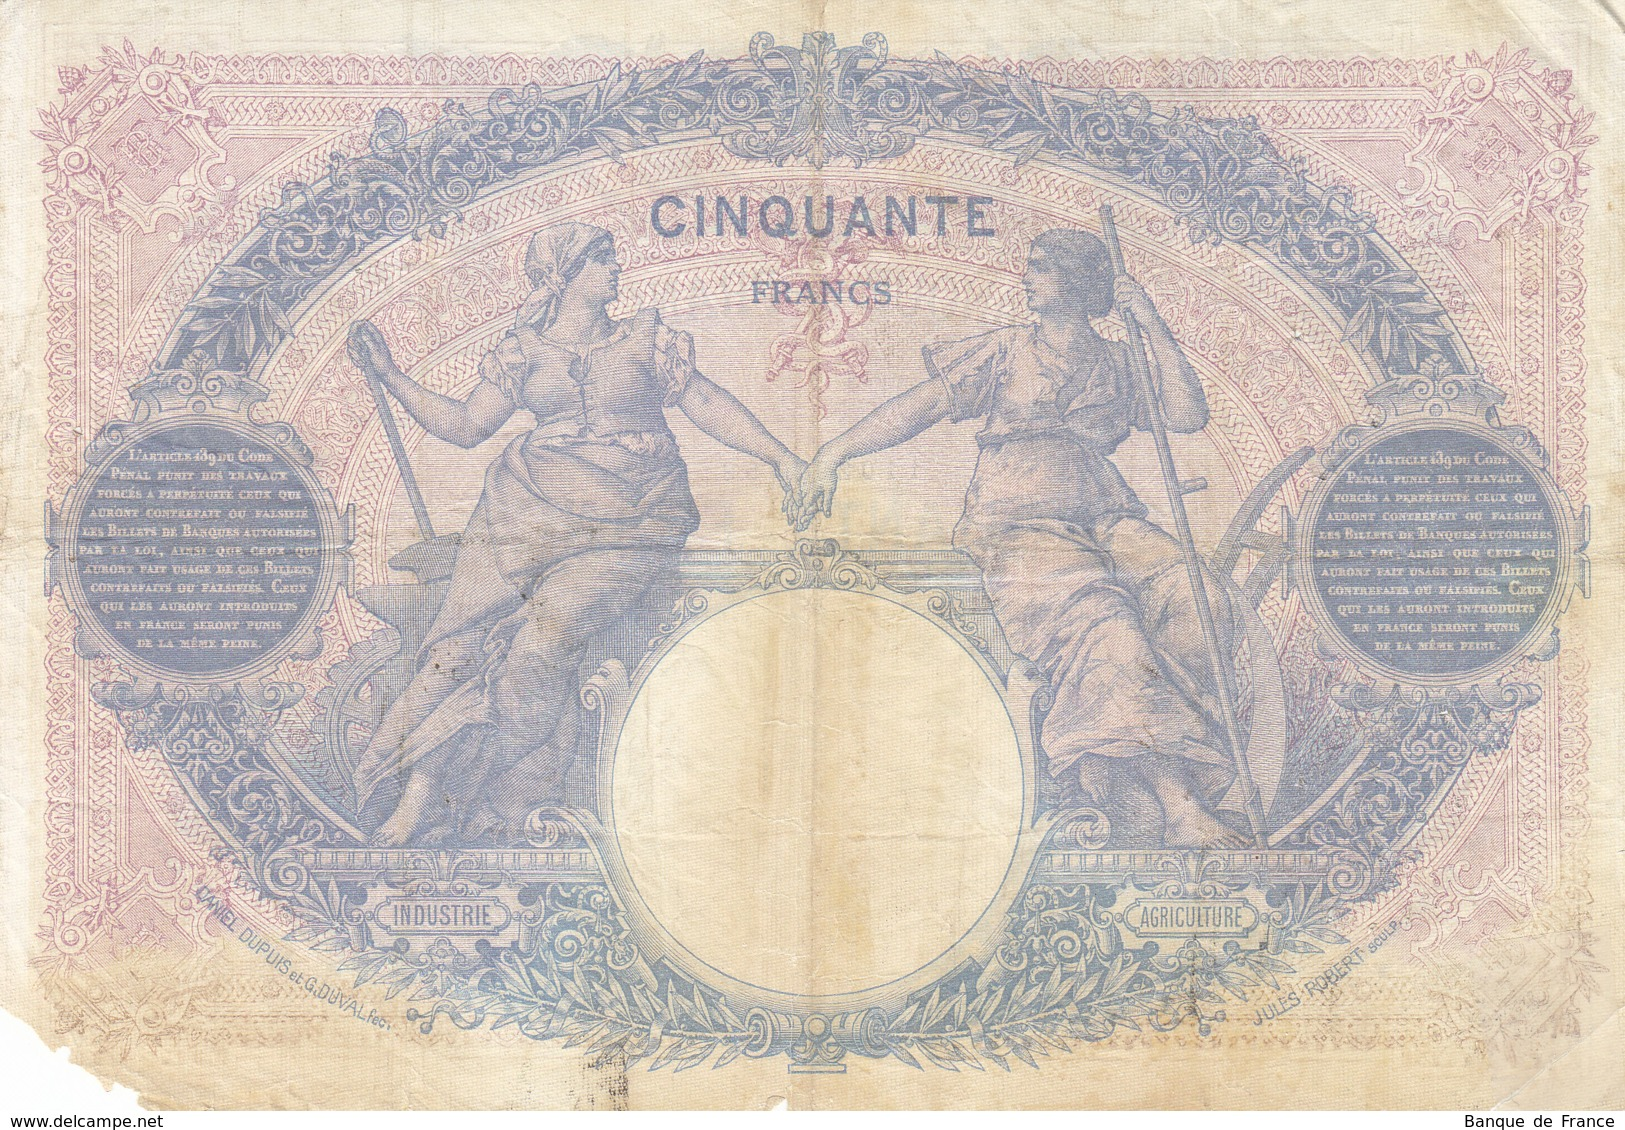 Billet 50 F Bleu Et Rose Du 10-9-1912 FAY 14.25 Alph. Y.4412 - 1871-1952 Circulated During XXth